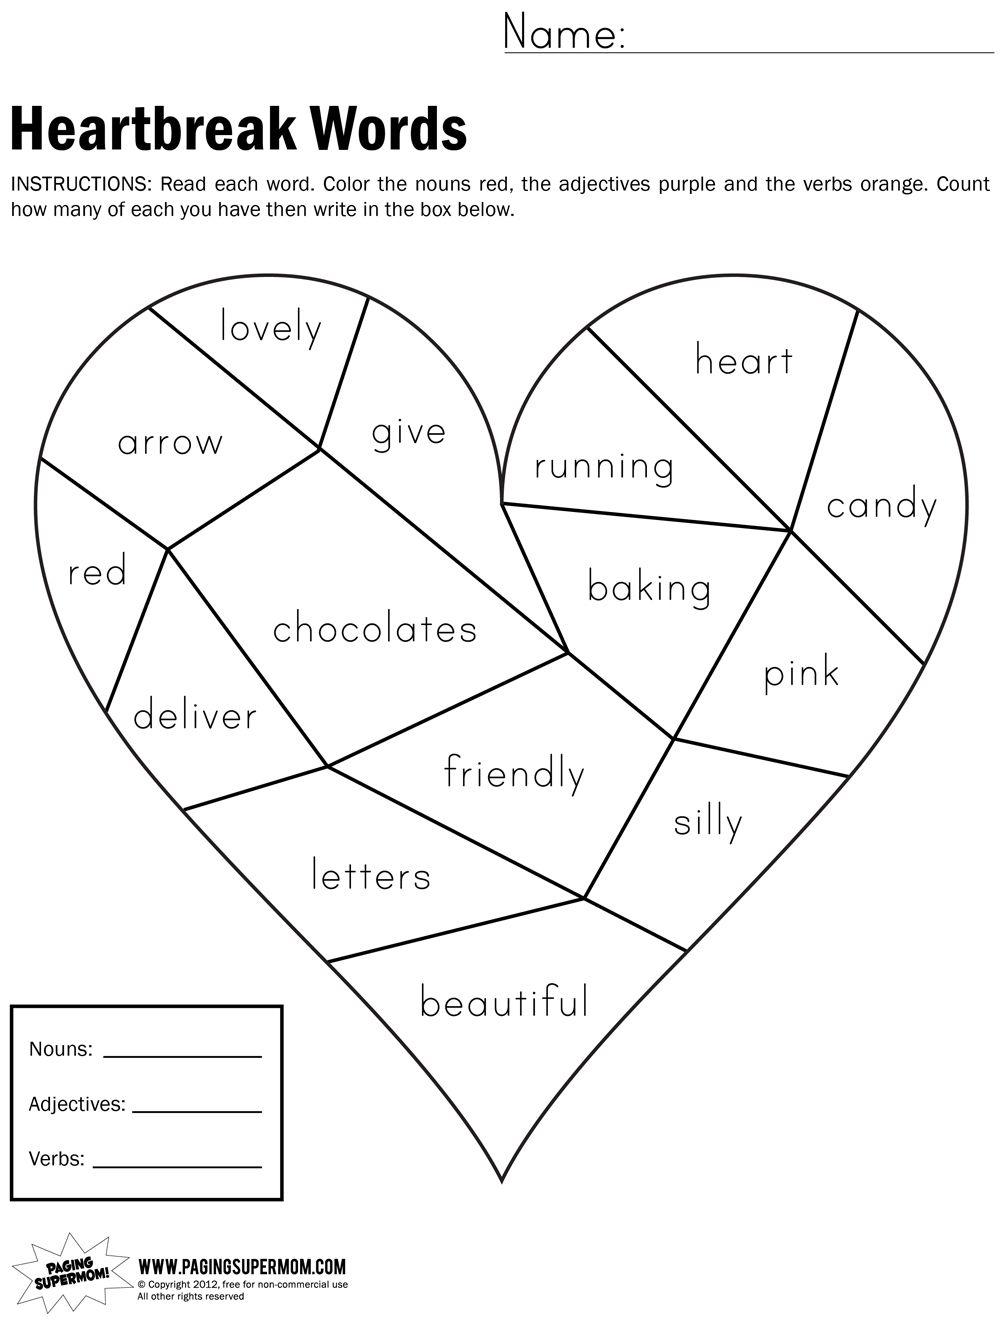 Heartbreak Words Free Printable Worksheet Paging Supermom Color Worksheets Math Coloring Worksheets Valentine Worksheets